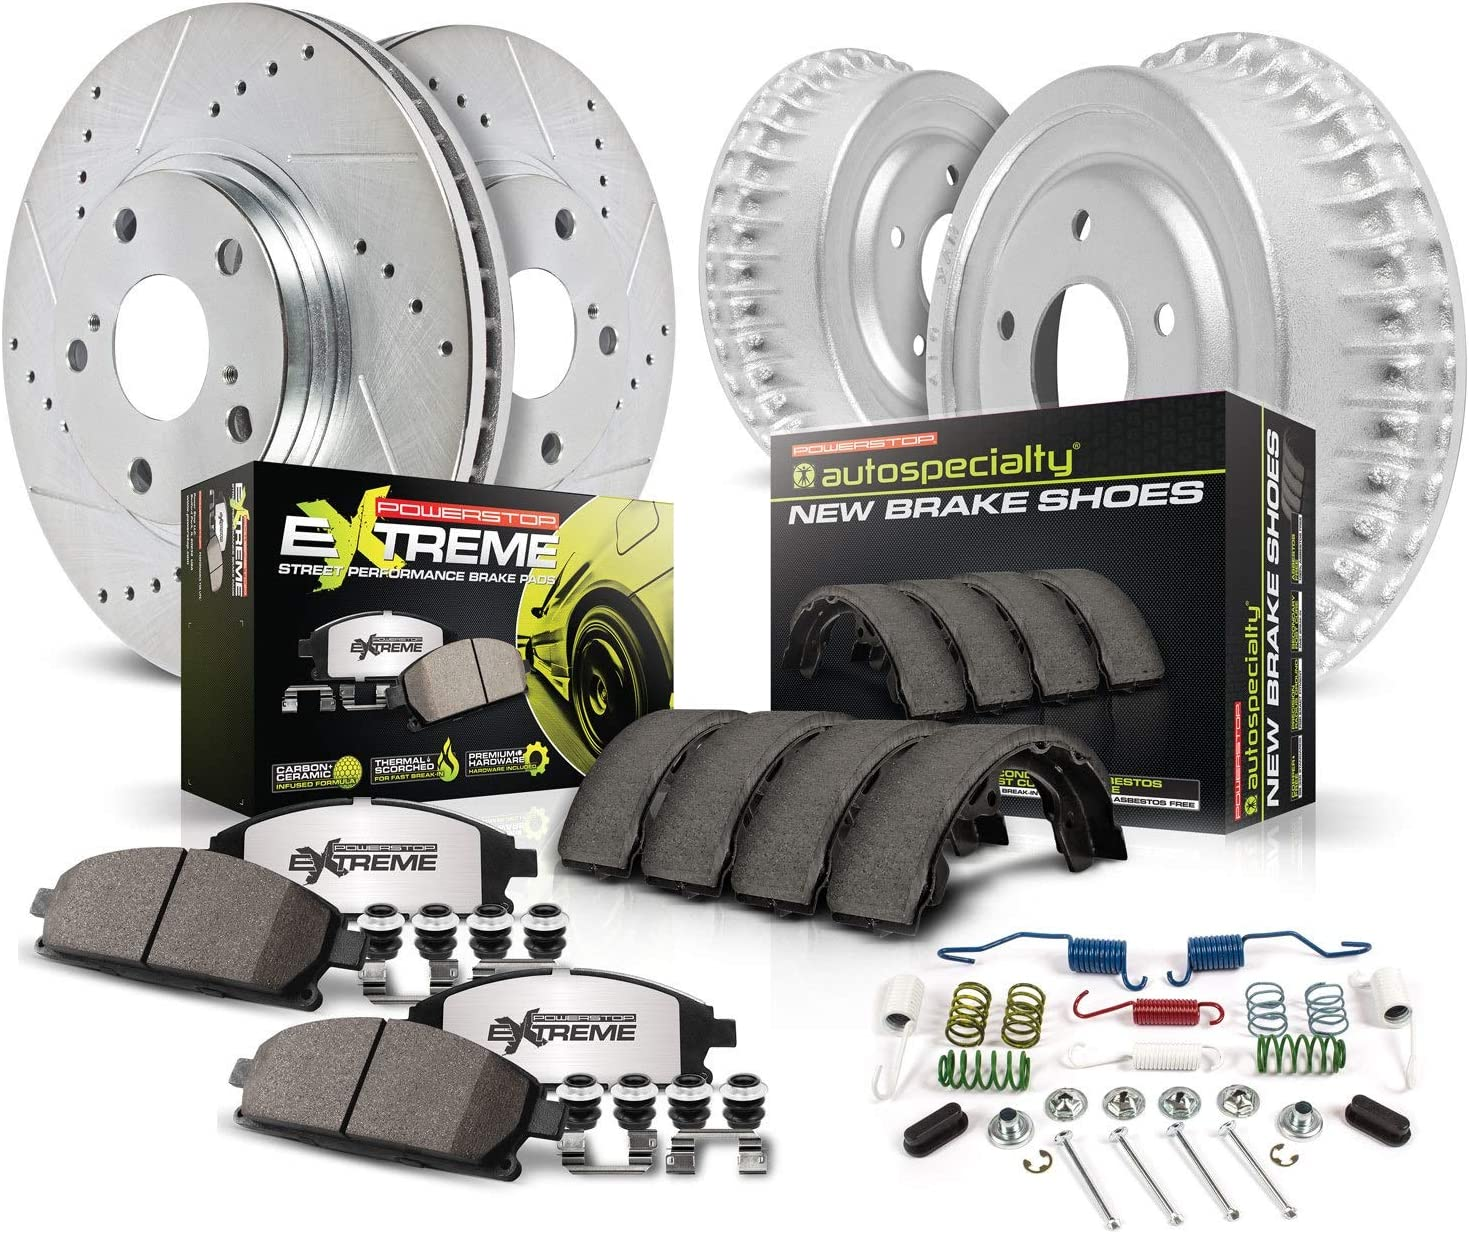 Power Stop K15441DK-26,Z26 Street Warrior Front and Rear Brake Kit-Drilled//Slotted Rotors /& Carbon-Fiber Cermaic Brake Pads